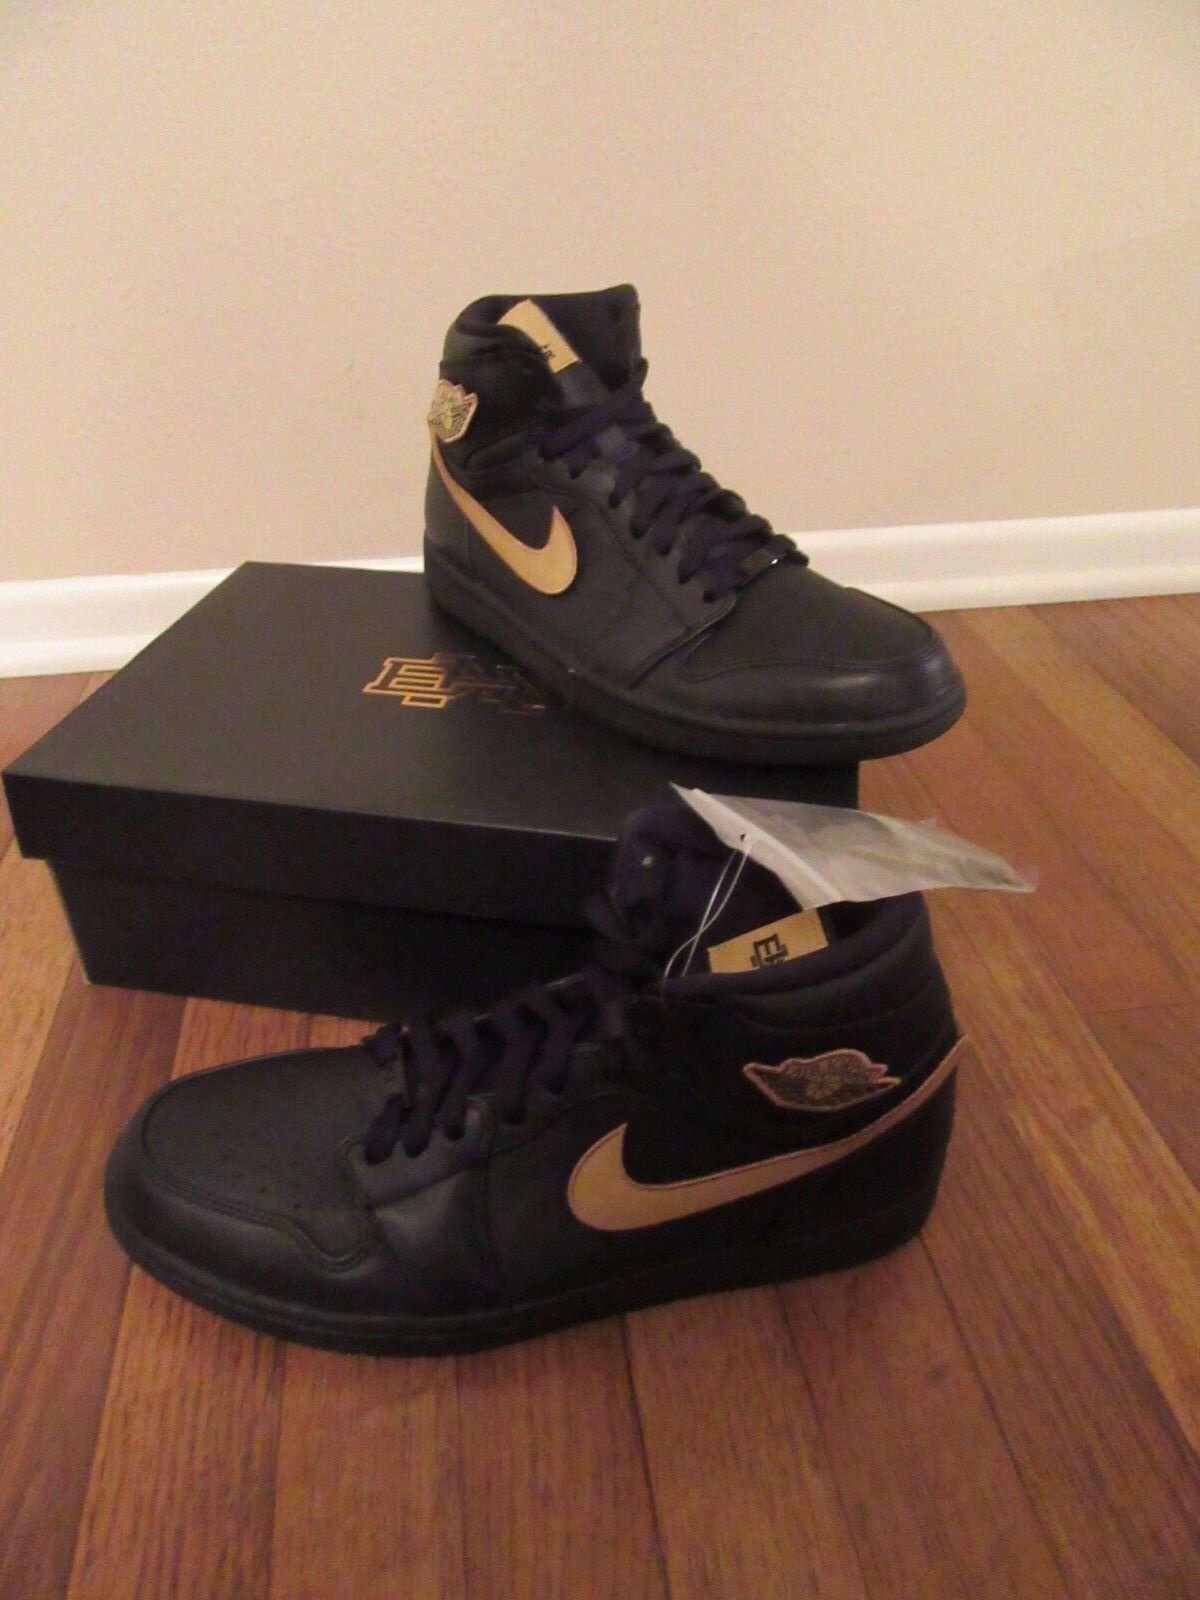 Nike Air Jordan 1 Retro High BHM Patch Size 11.5 Black gold 908656 001 NEW NIB